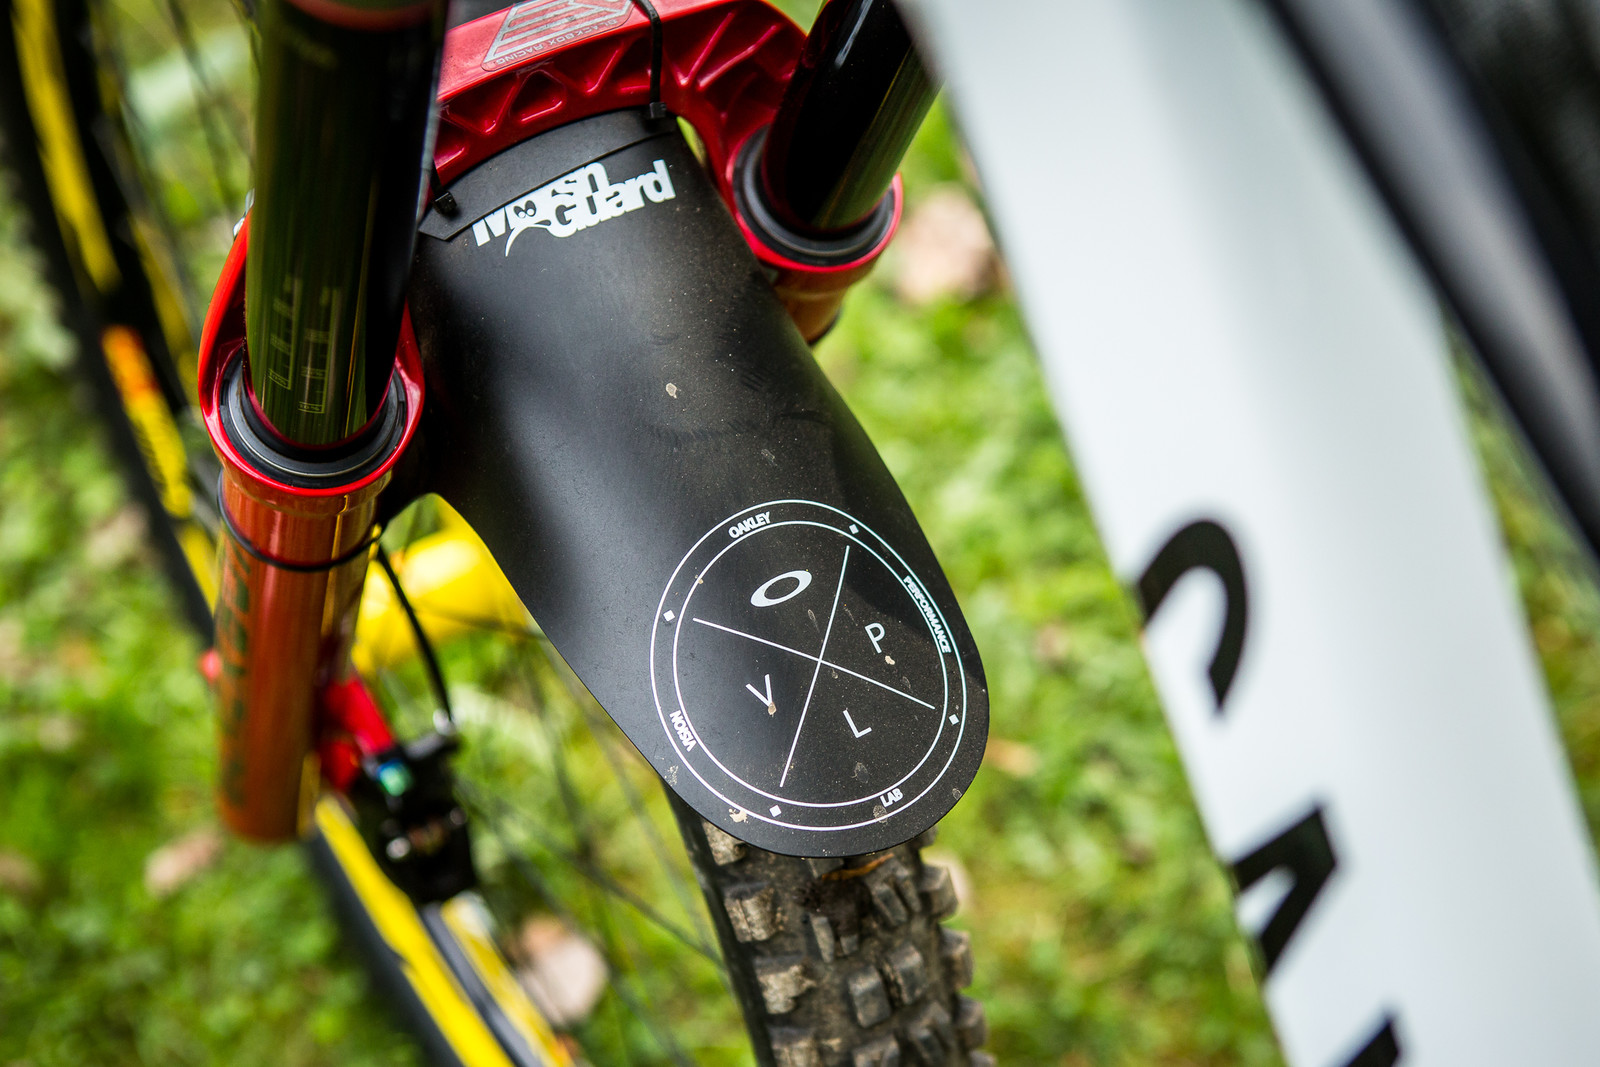 Marshguard with Oakley Graphics - Pro Bike Check: Troy Brosnan's Canyon Sender - Mountain Biking Pictures - Vital MTB